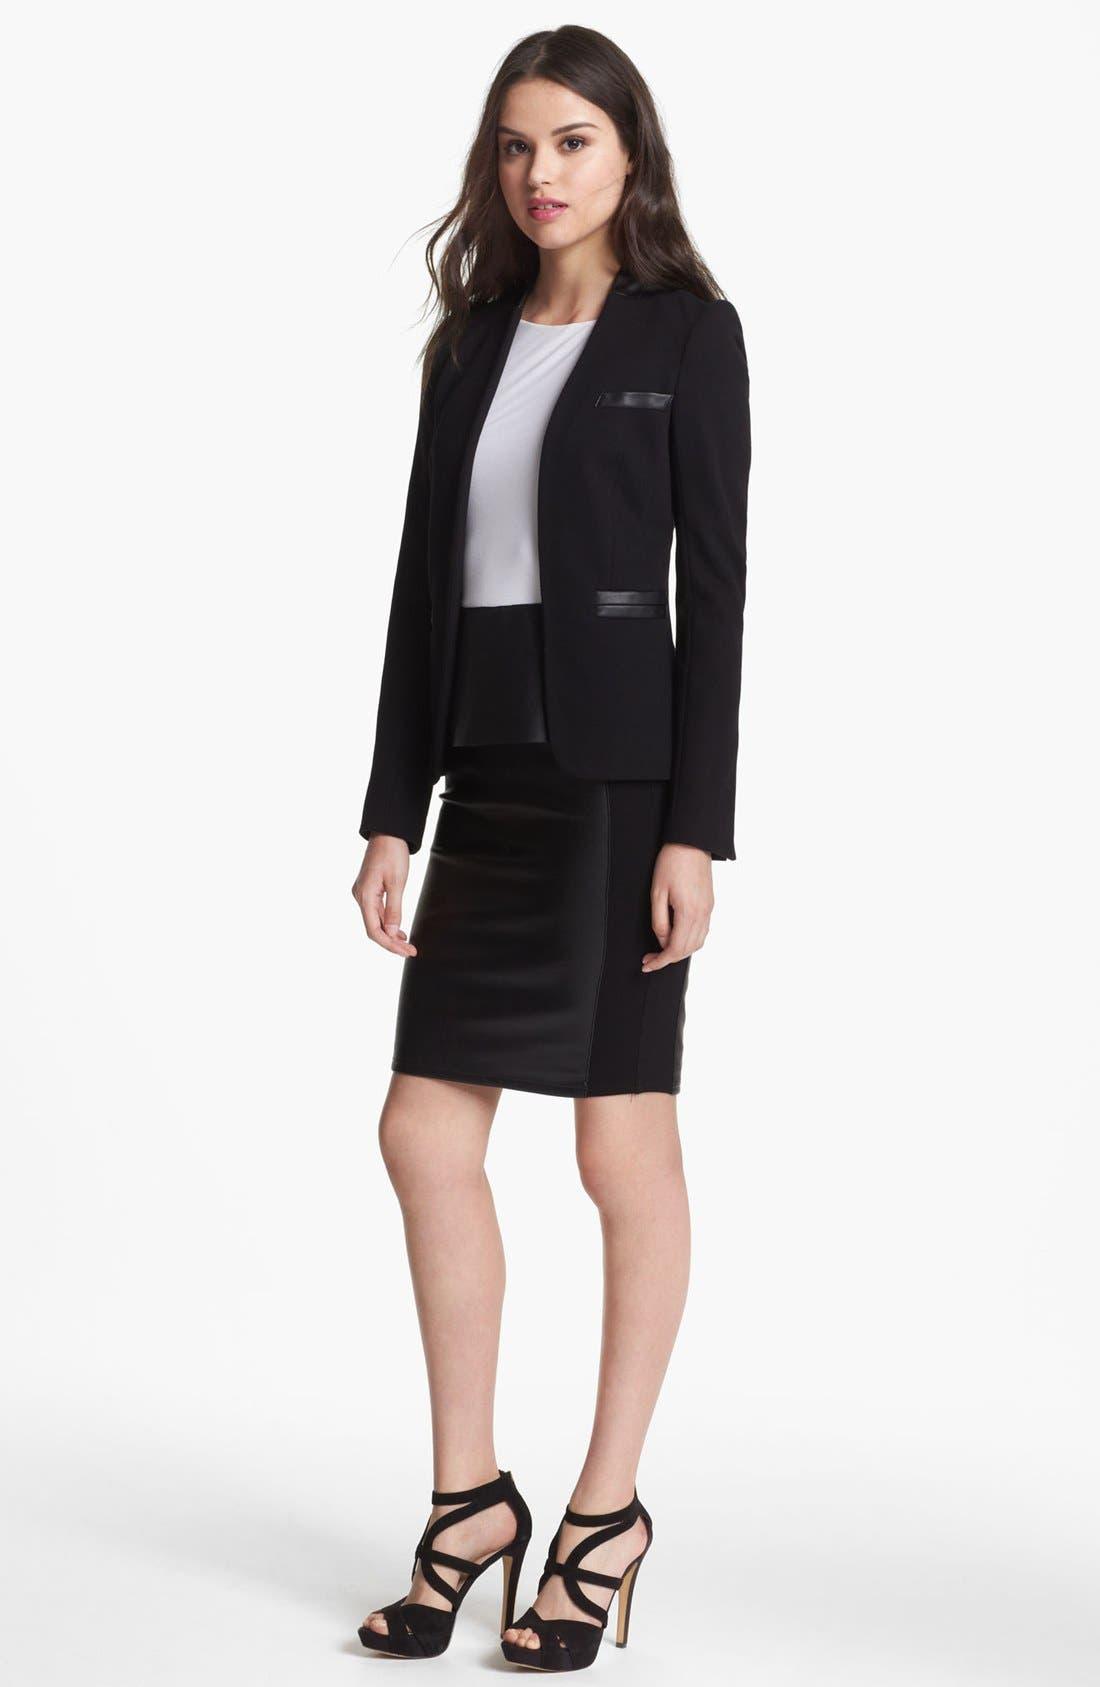 Main Image - Bailey 44 Jacket, Top & Skirt